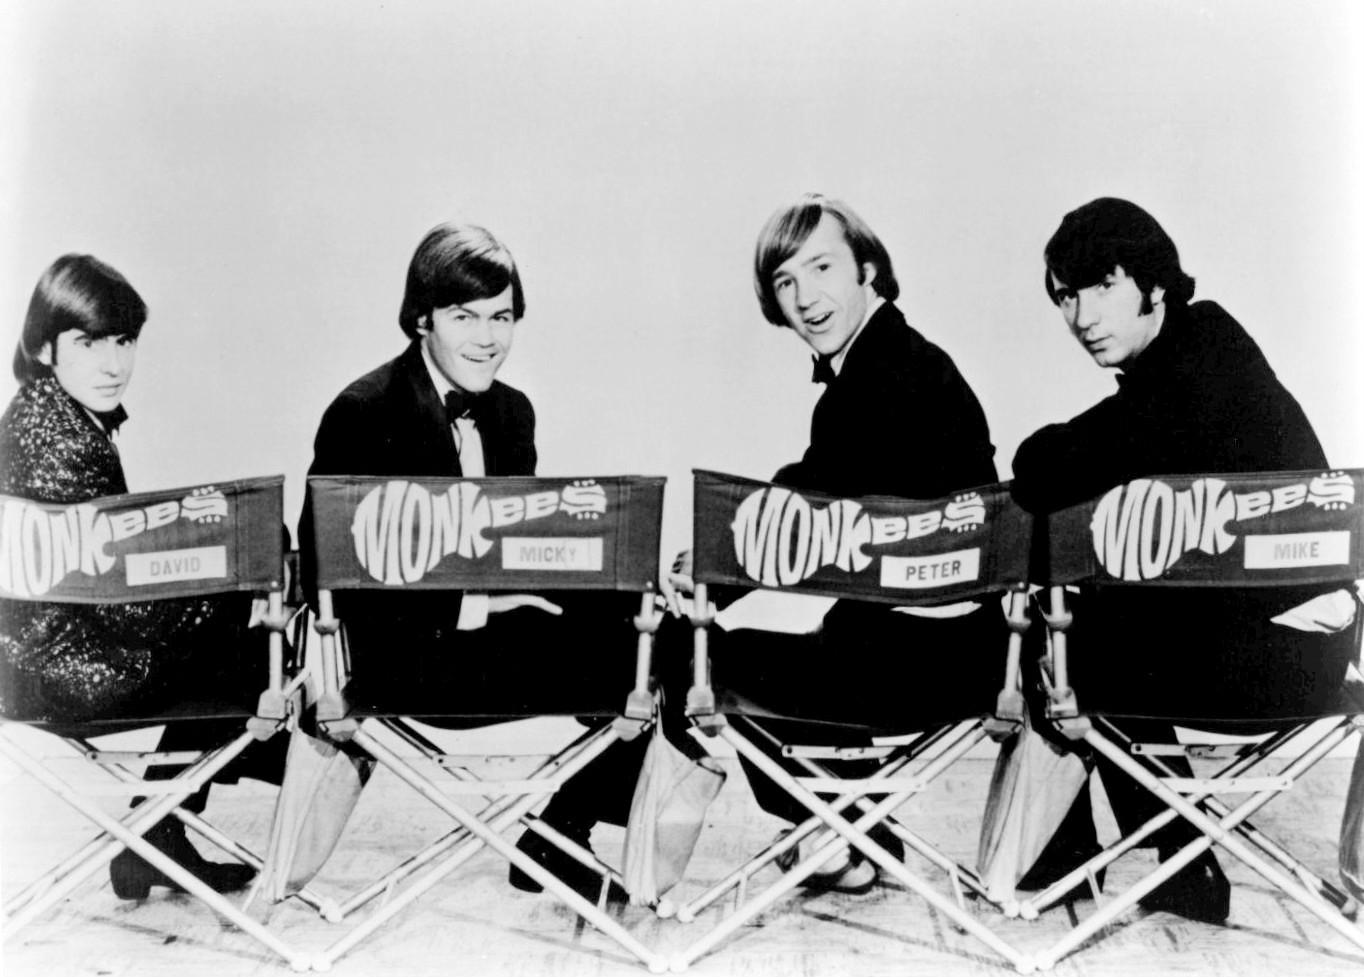 The_Monkees.jpg